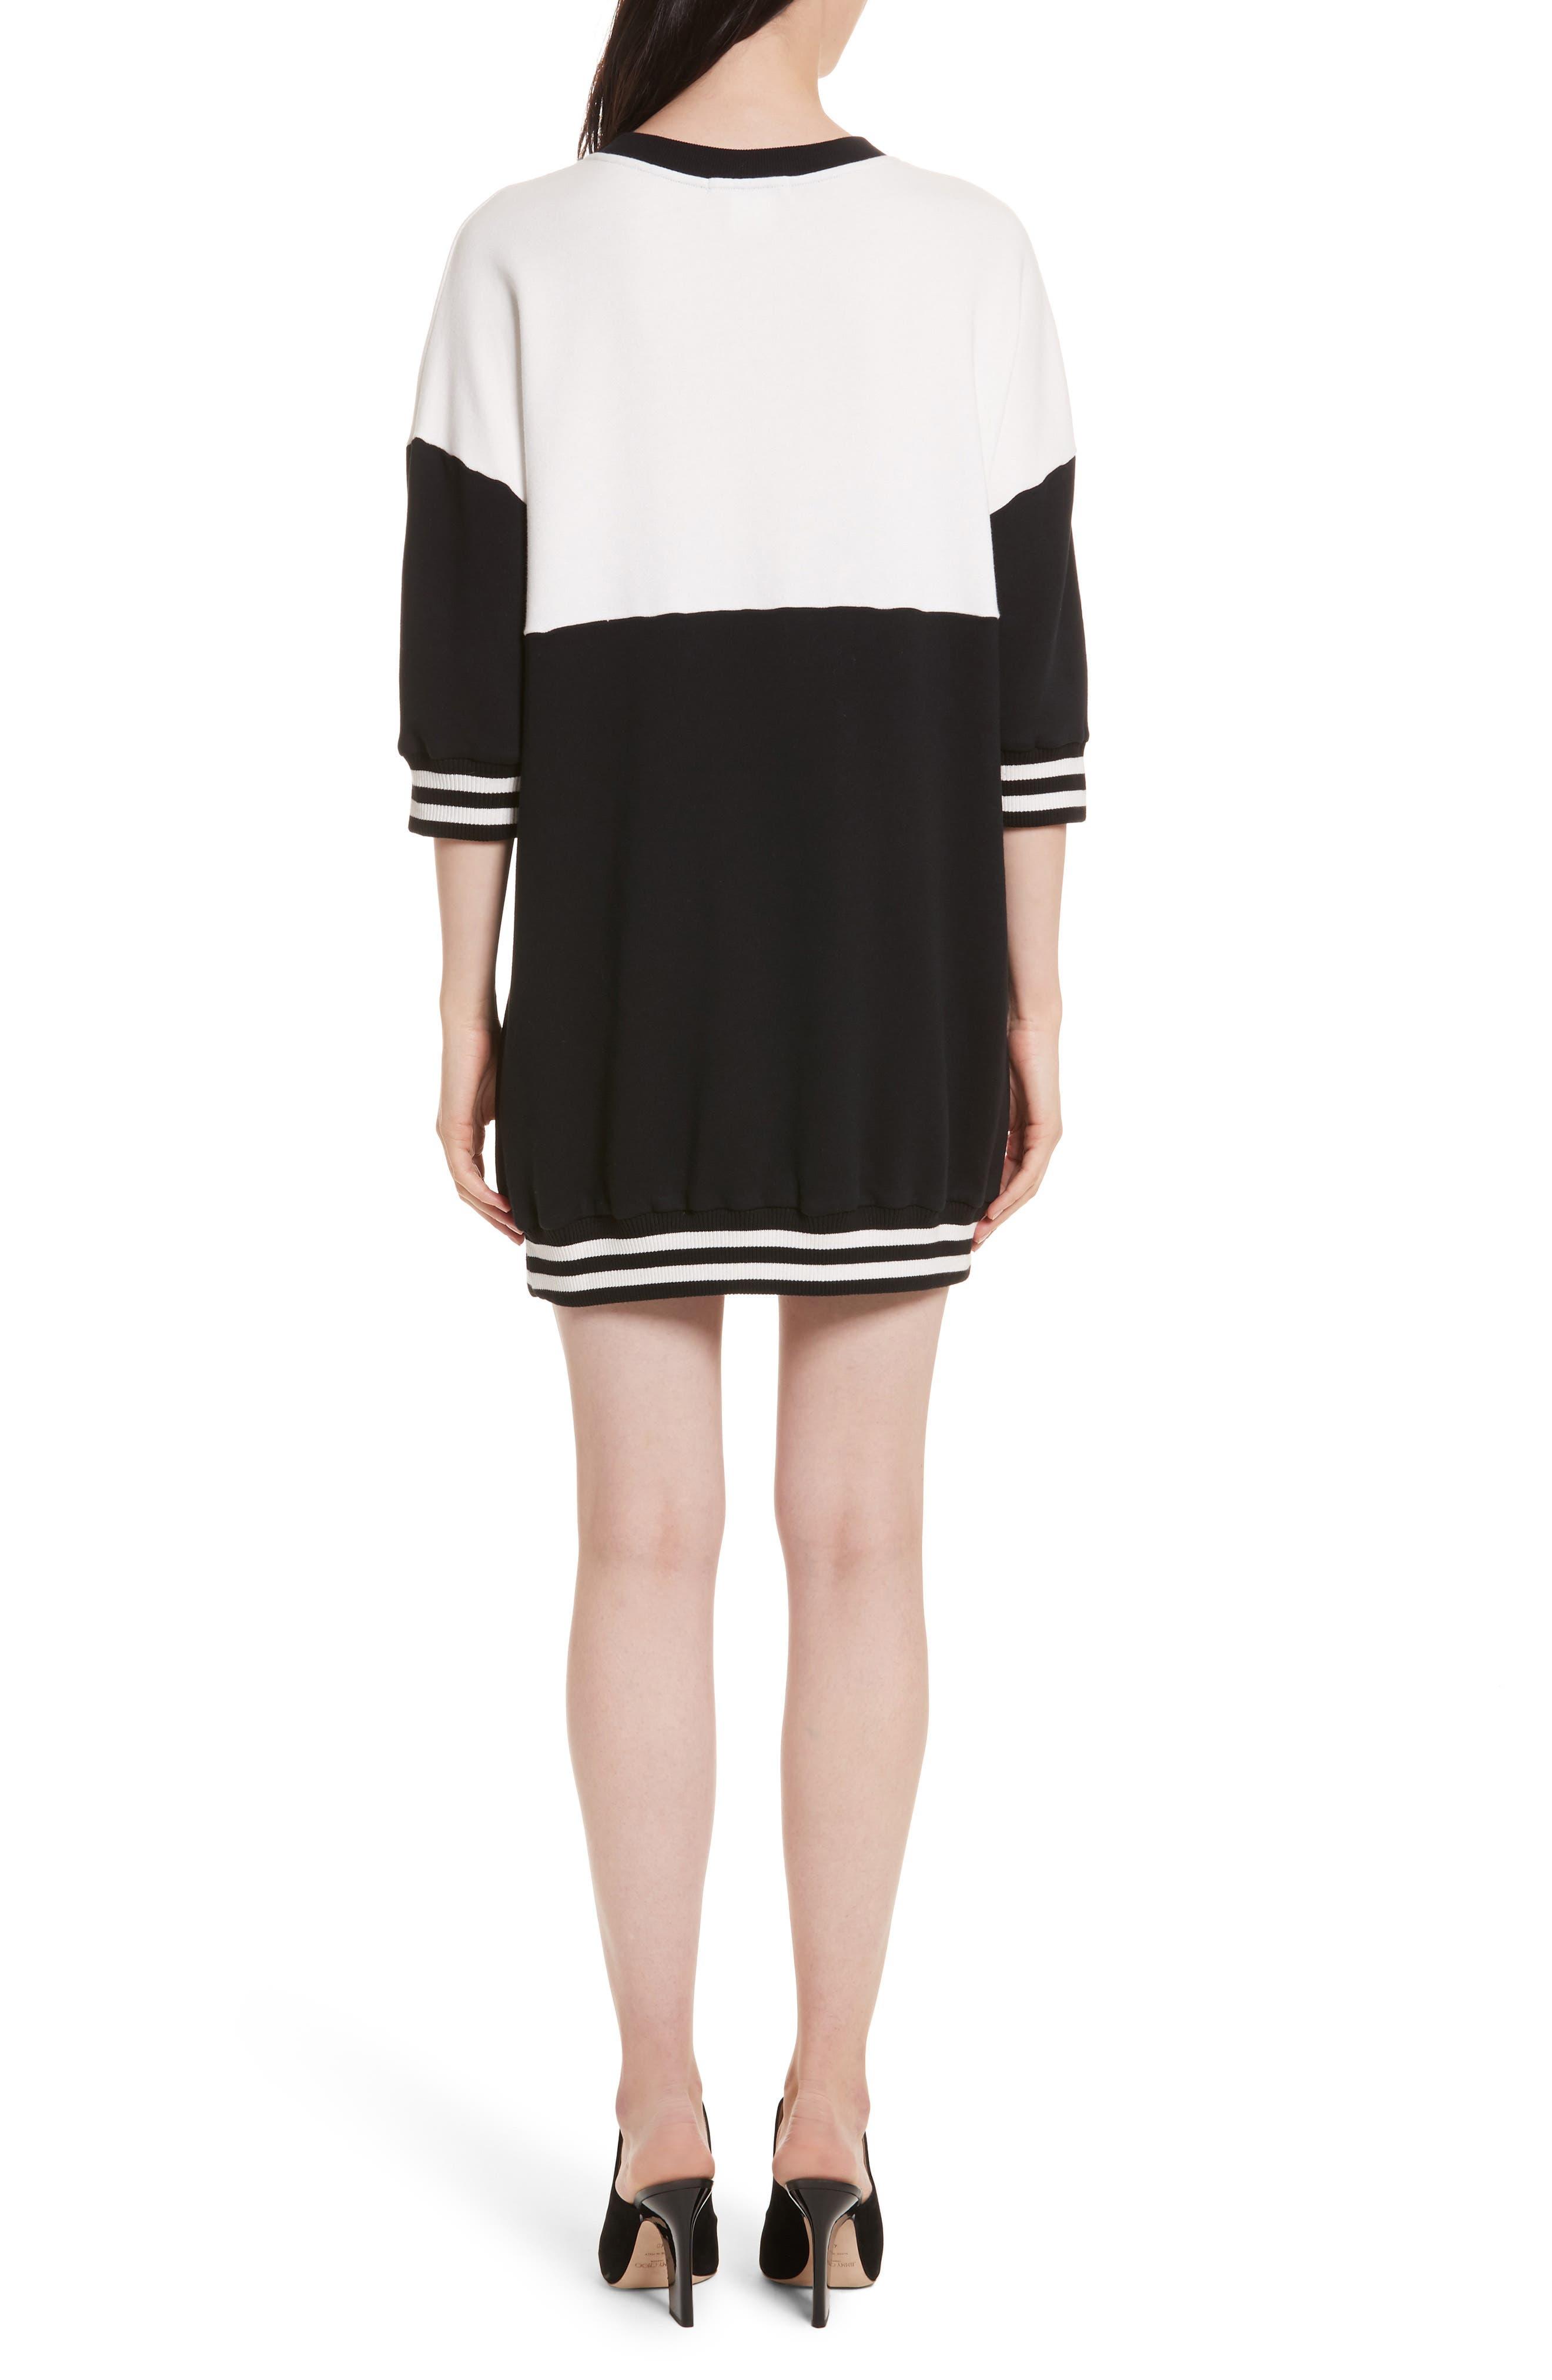 Gussie Colorblock Sweatshirt Dress,                             Alternate thumbnail 2, color,                             Black/ Off White